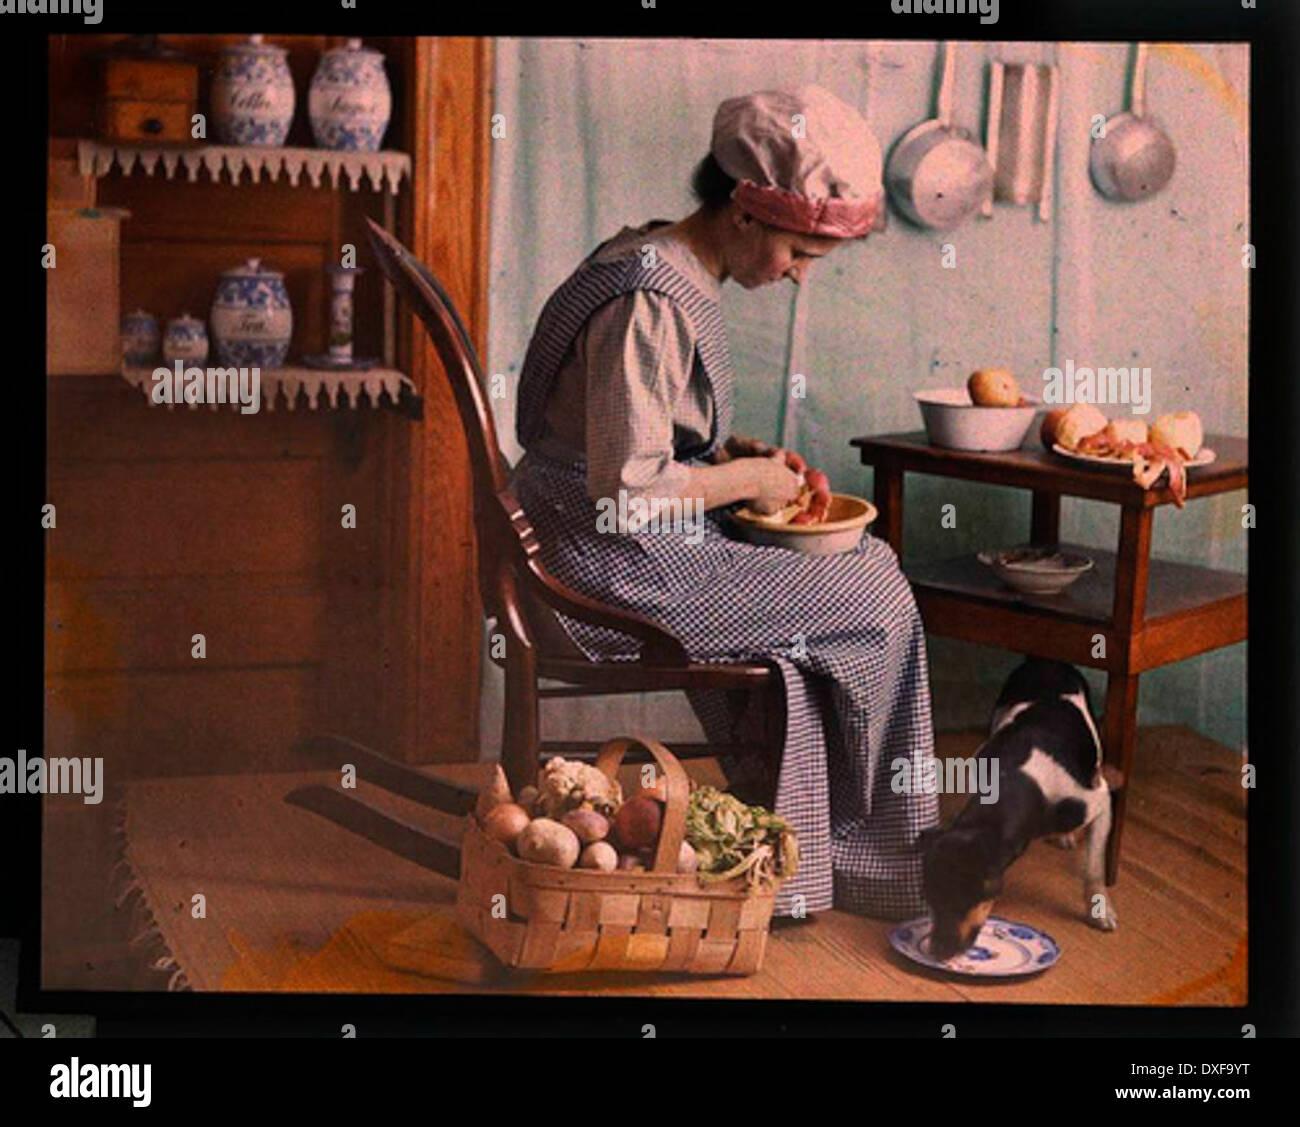 Genre scene, woman in kitchen peeling vegetables - Stock Image